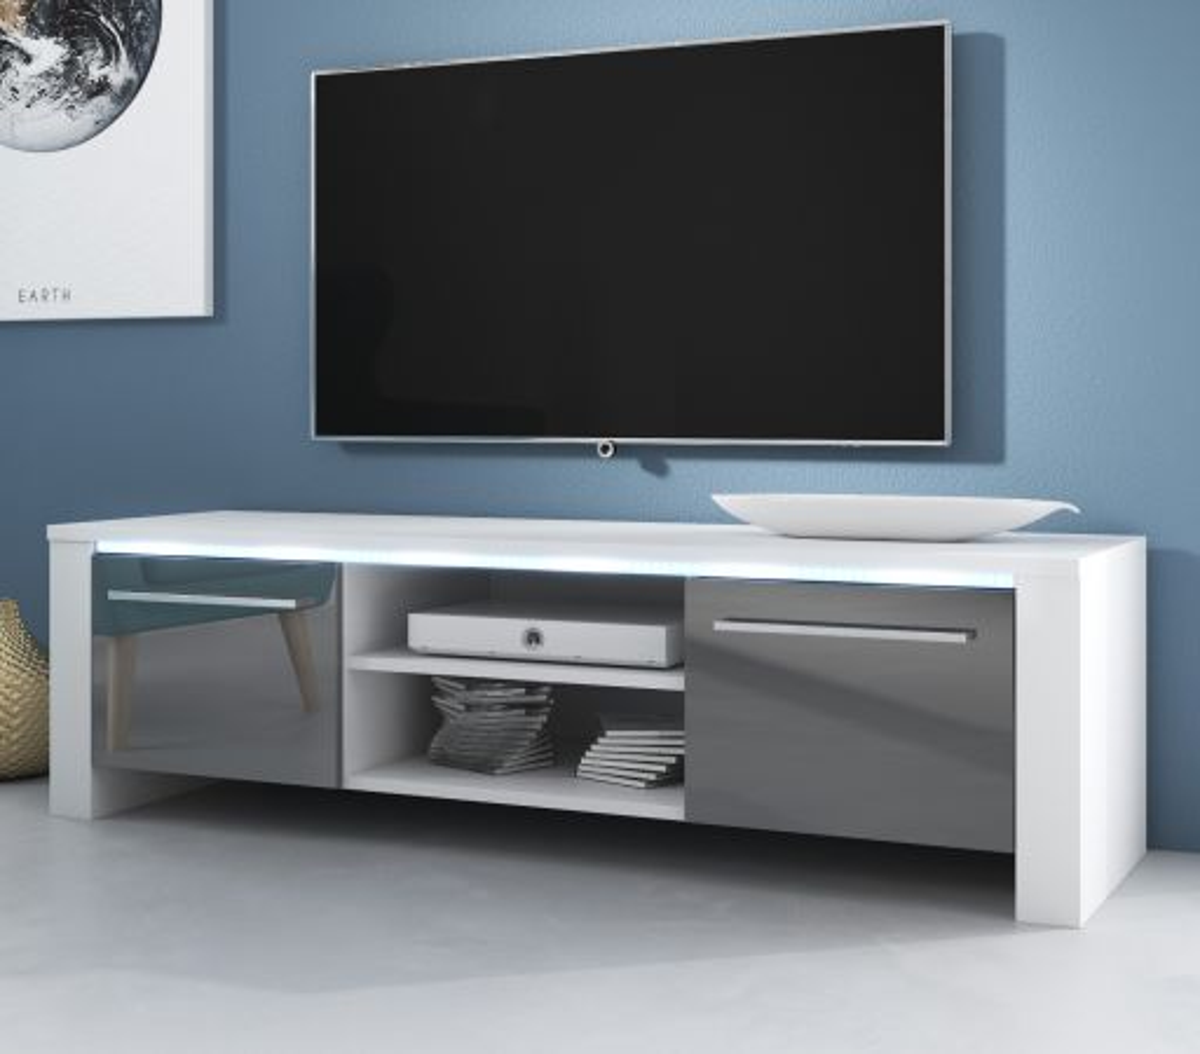 TV-Lowboard Harlem Hochglanz grau mit Beleuchtung 140 cm